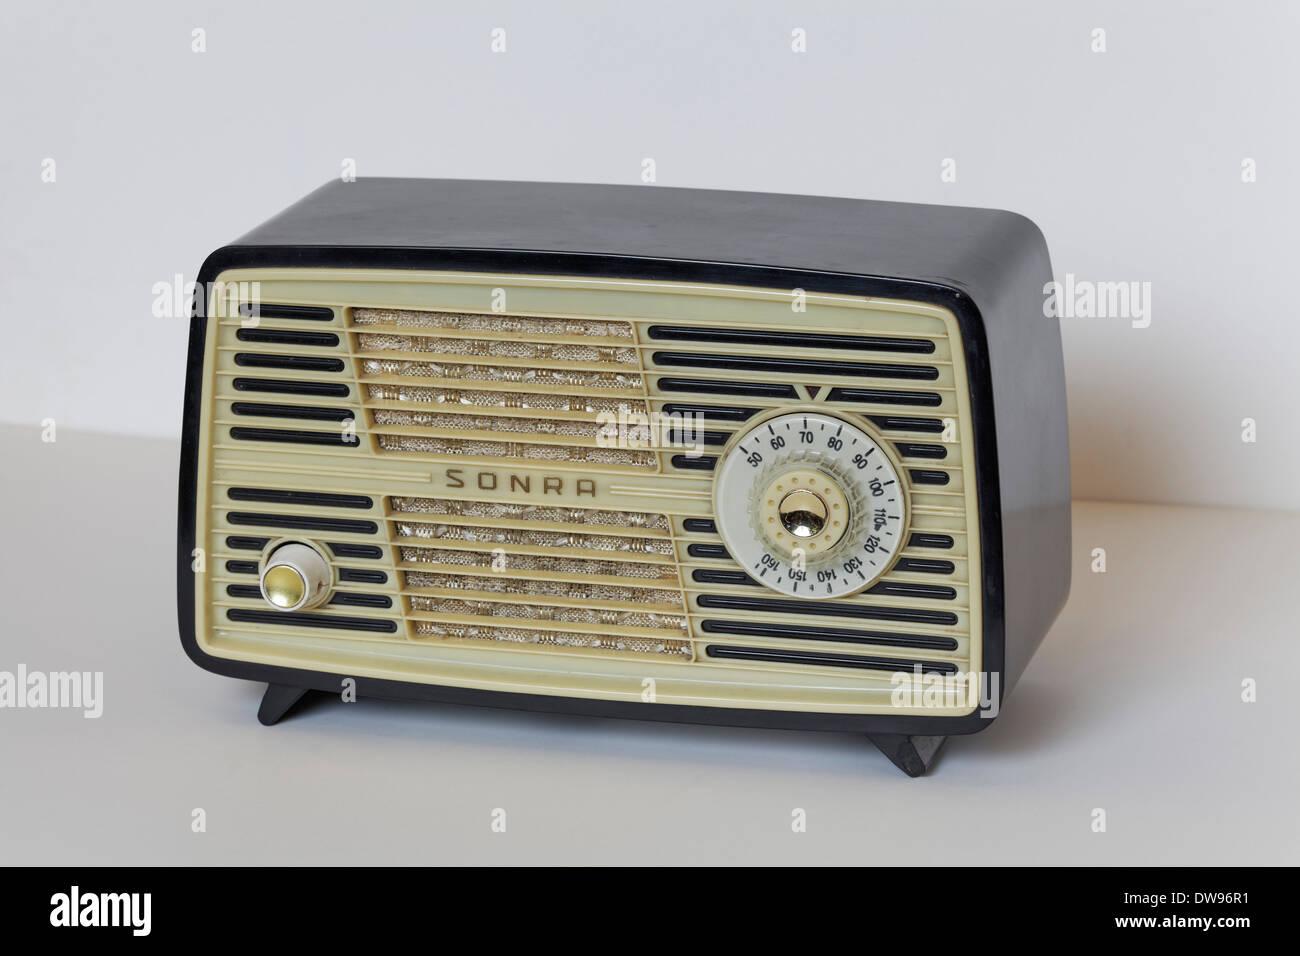 Radio of the GDR brand Sonra from 1950, Stern Radio Sonneberg, Radio Museum Duisburg, North Rhine-Westphalia, Germany - Stock Image